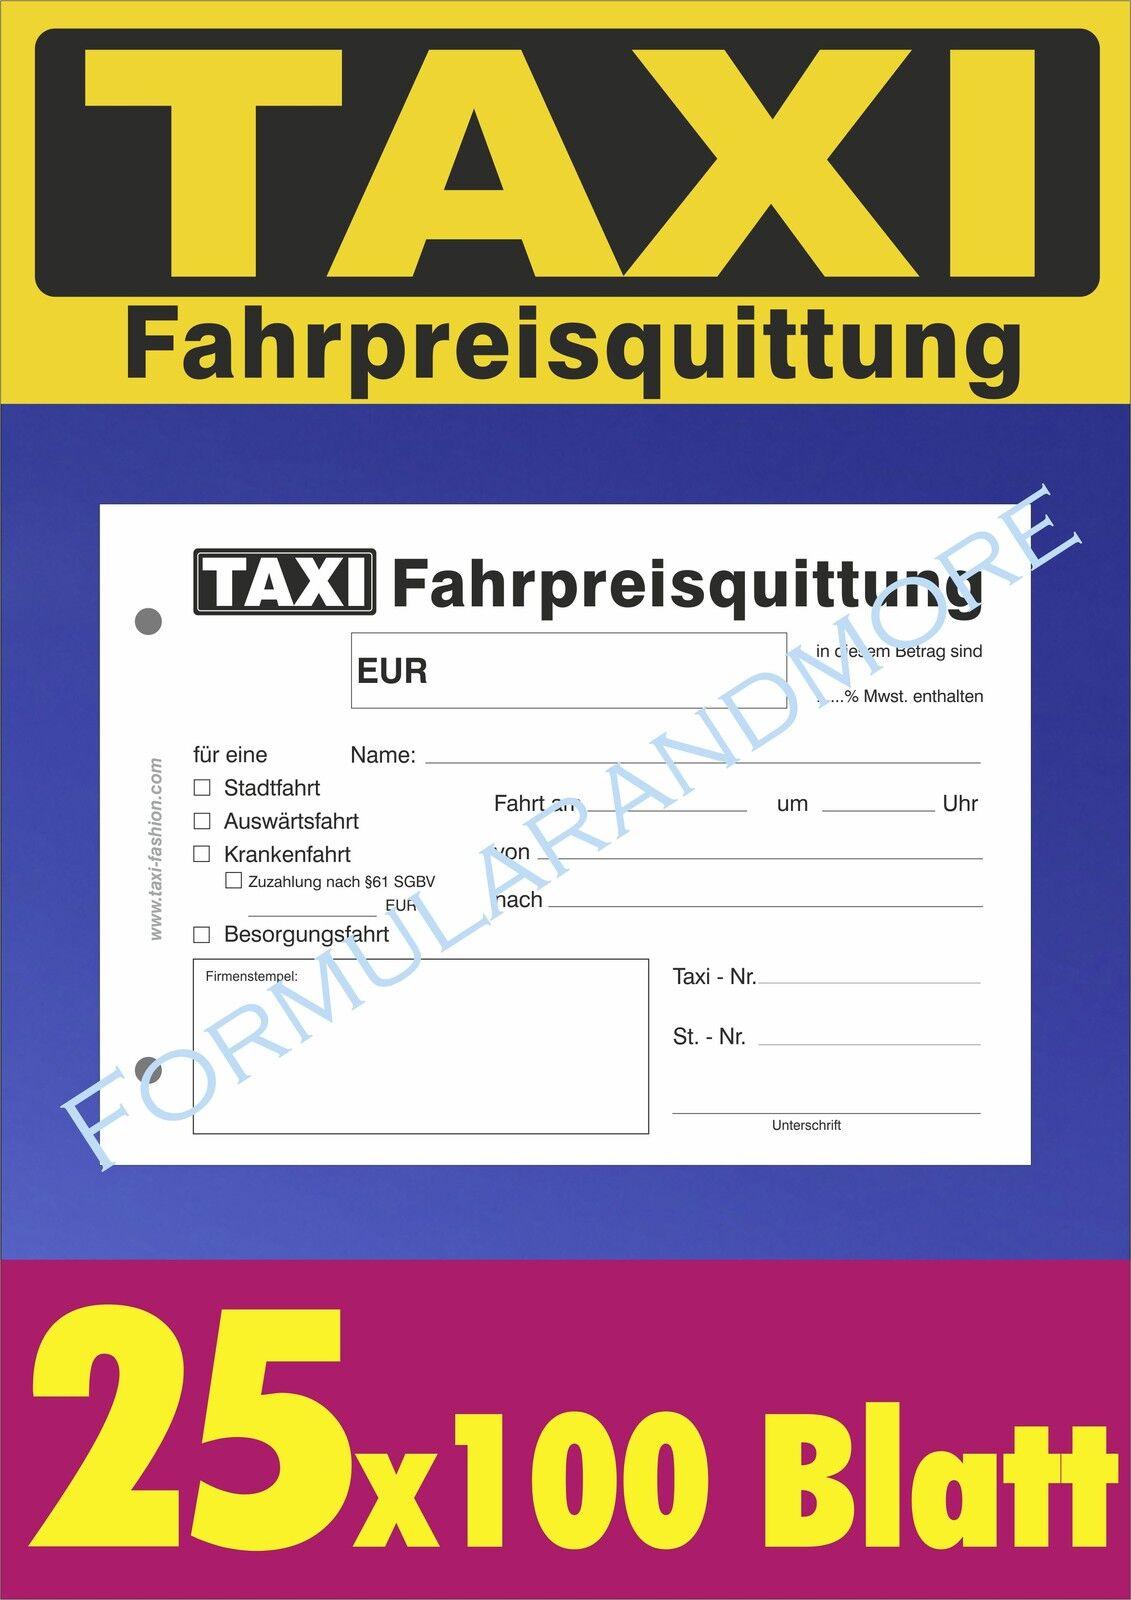 gelocht 2 x 50 Blatt DIN A6 Taxi-Fahrpreisquittung als Block SD -durchschreibend 20x Taxiquittung 22428